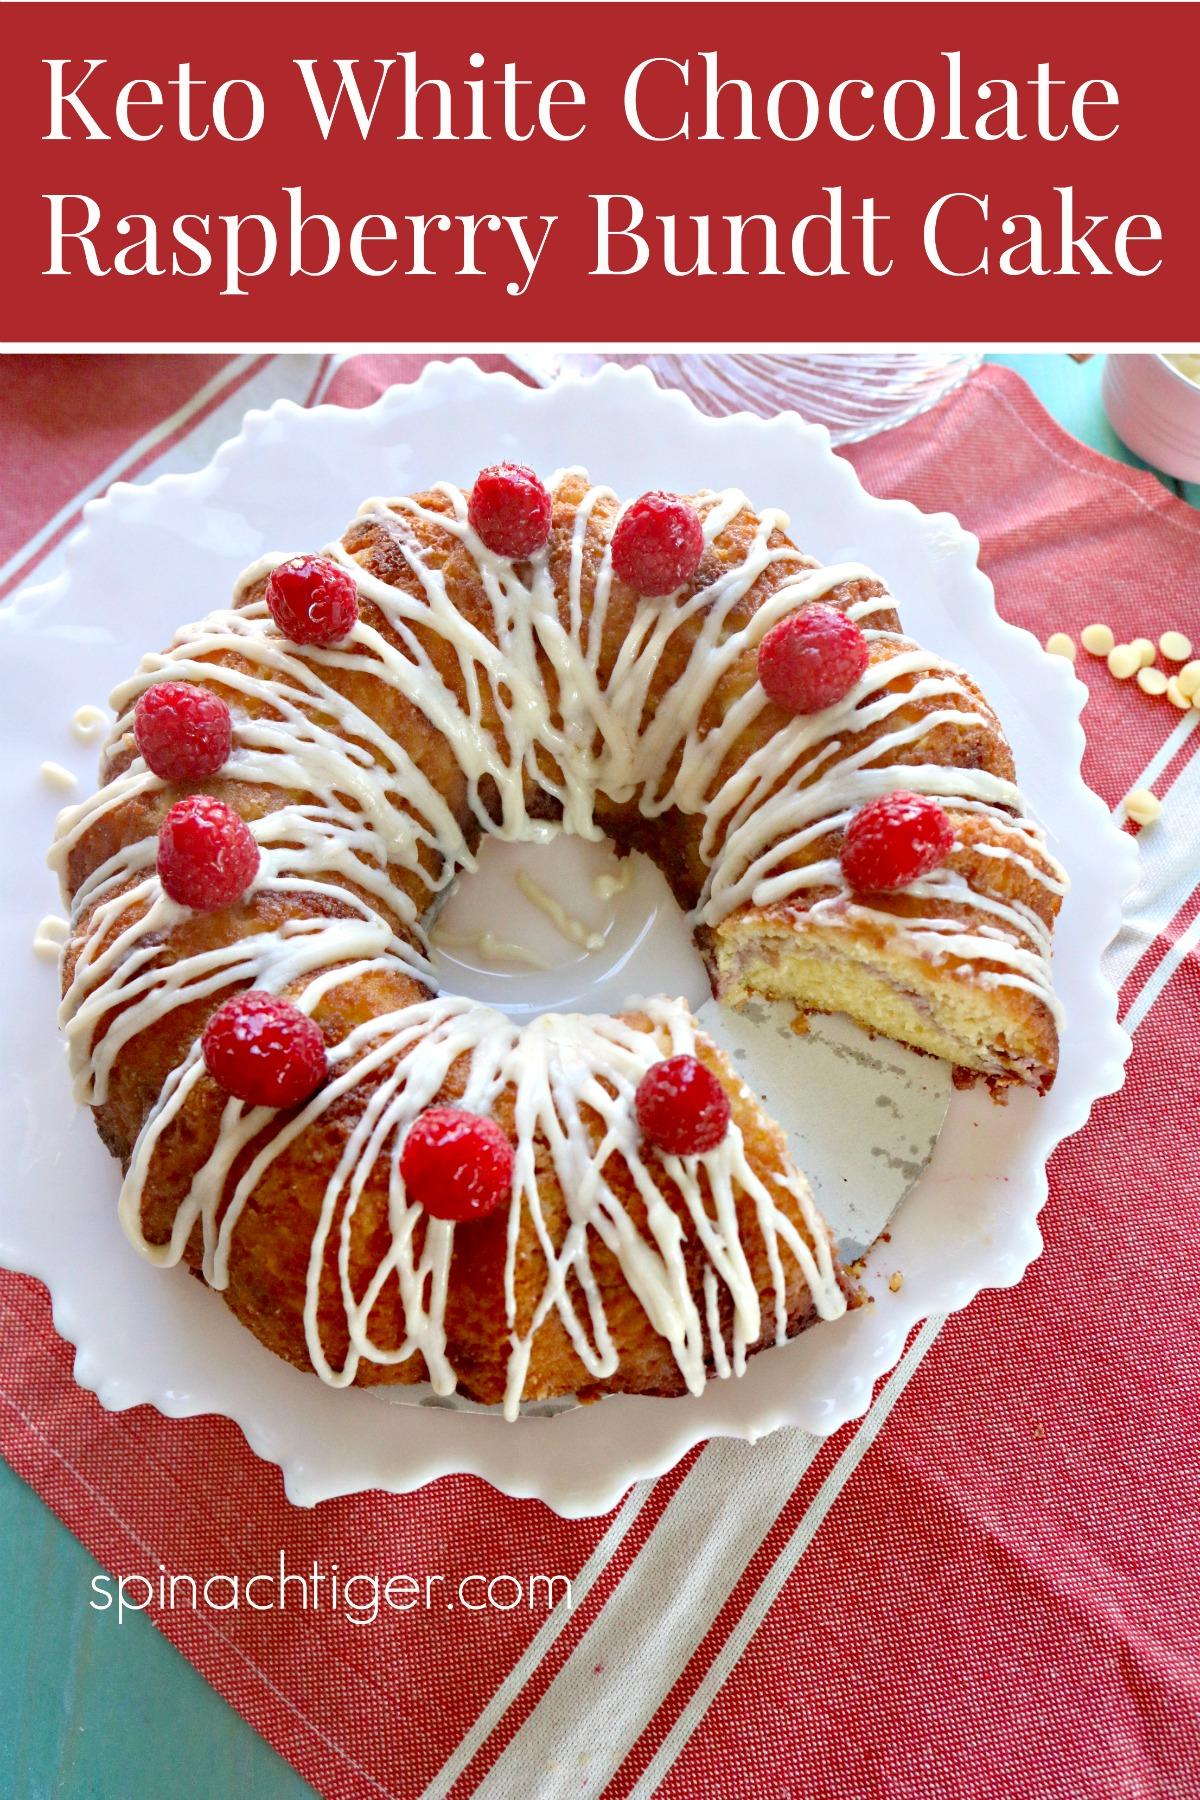 Keto White Chocolate Raspberry Bundt Cake with Cream Cheese Glaze